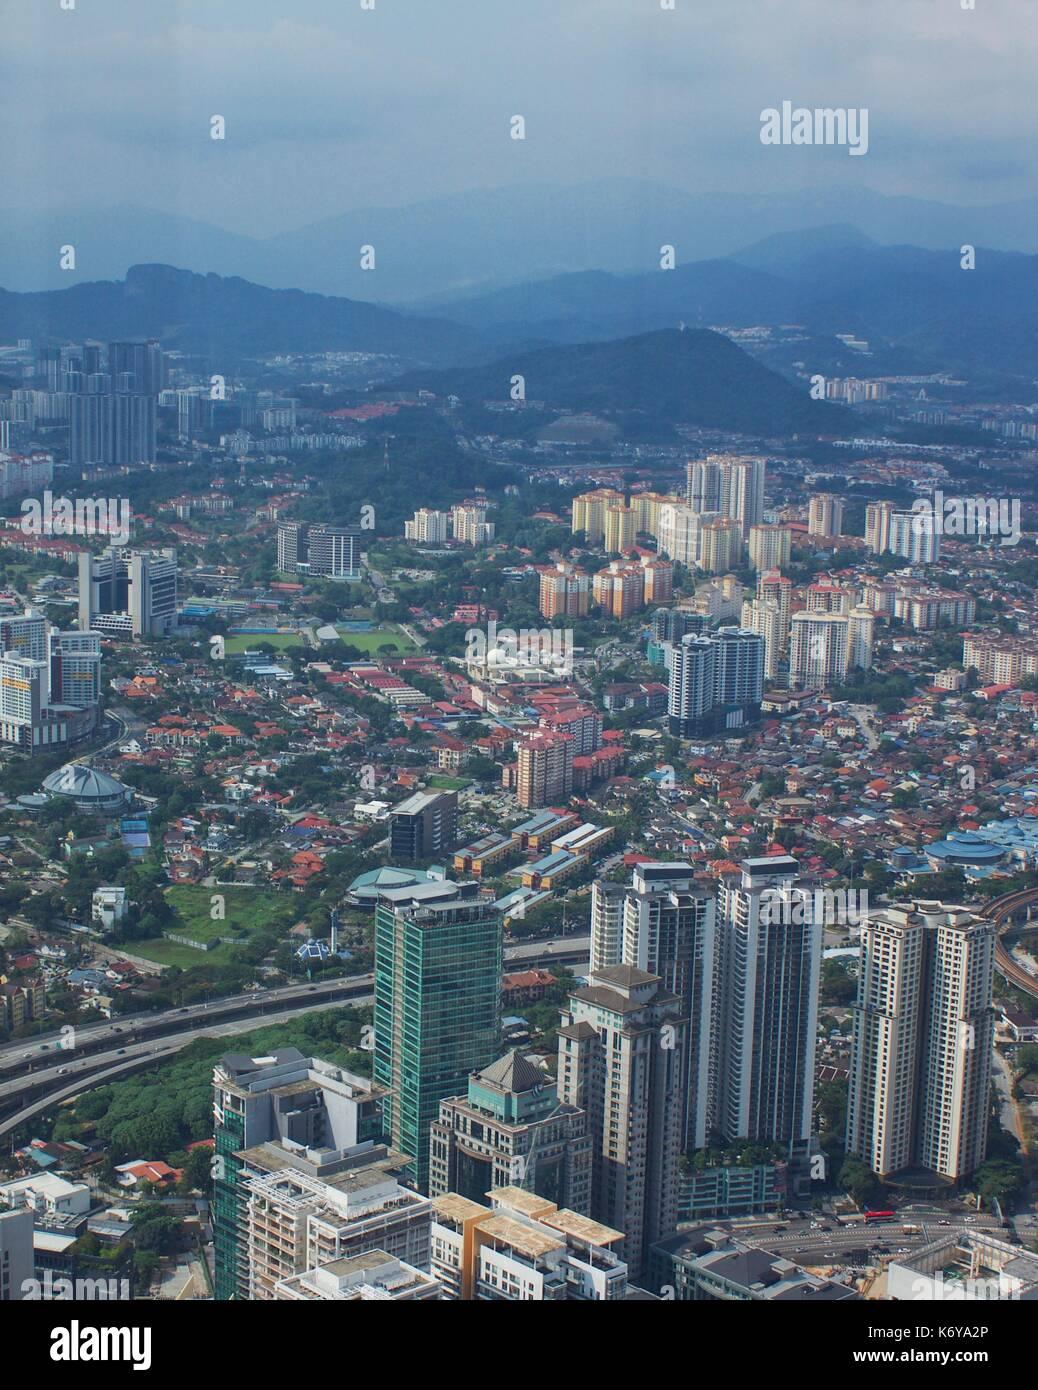 Kuala Lumpur city centre - Stock Image